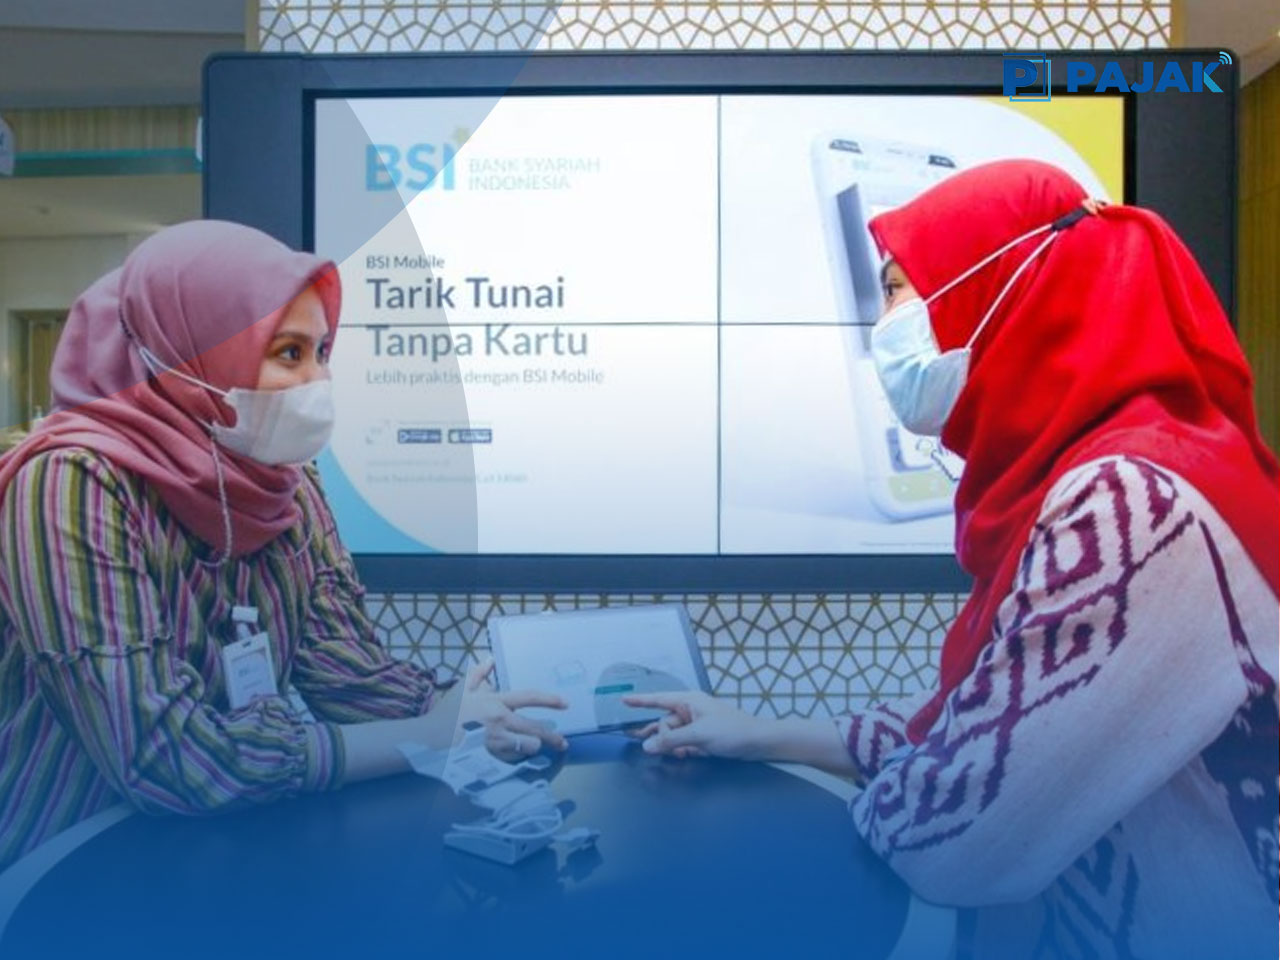 BSI: Volume Transaksi Digital Tembus Rp 40,85 Triliun ...